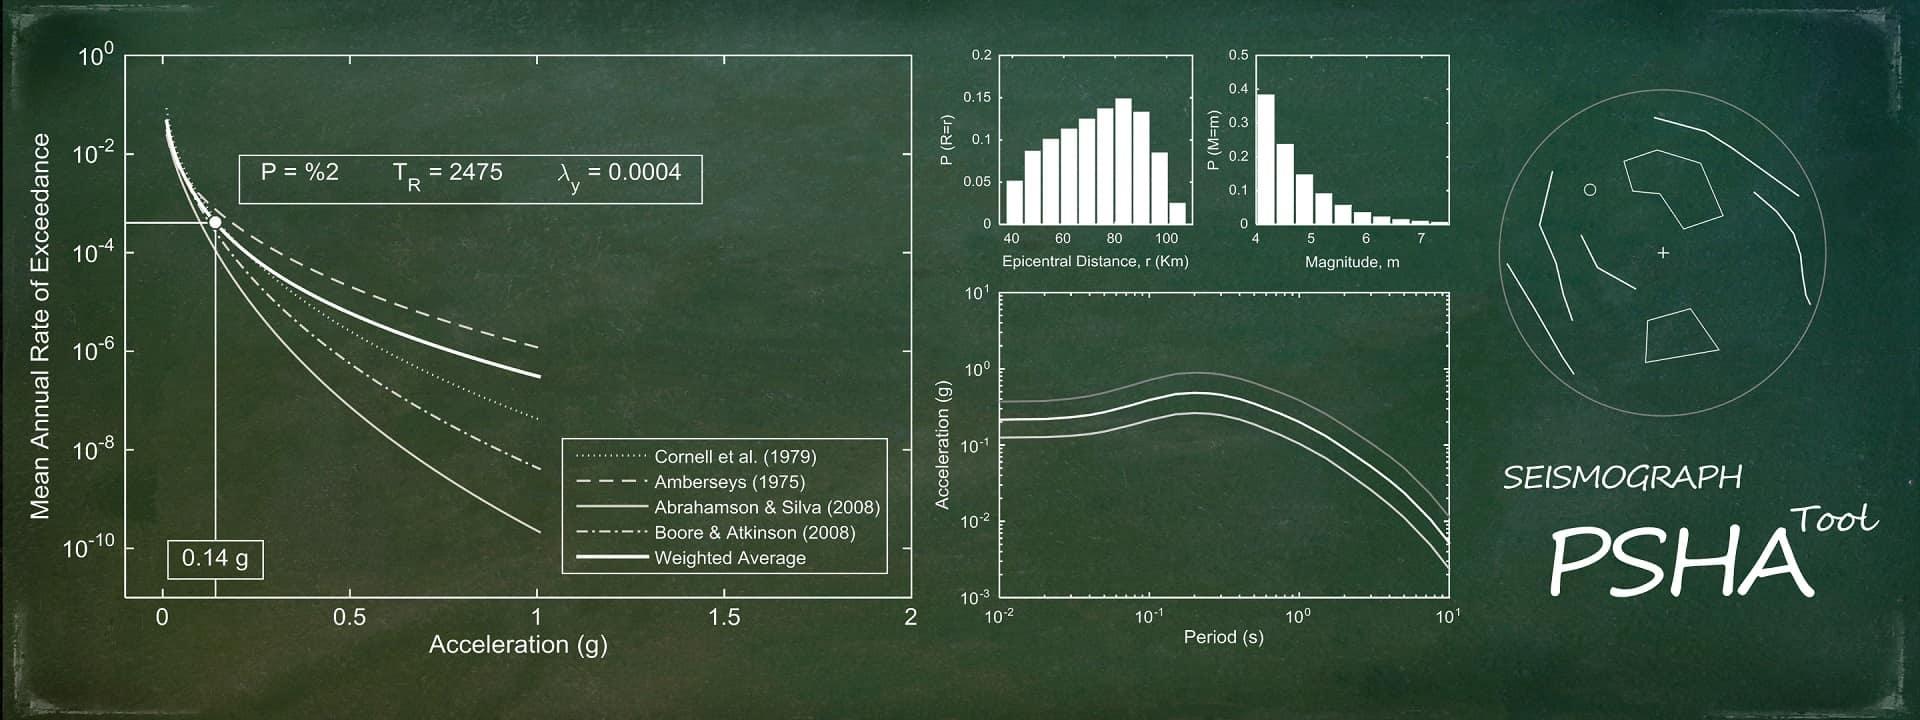 PSHA Tool: Probabilistic Seismic Hazard Analysis Software